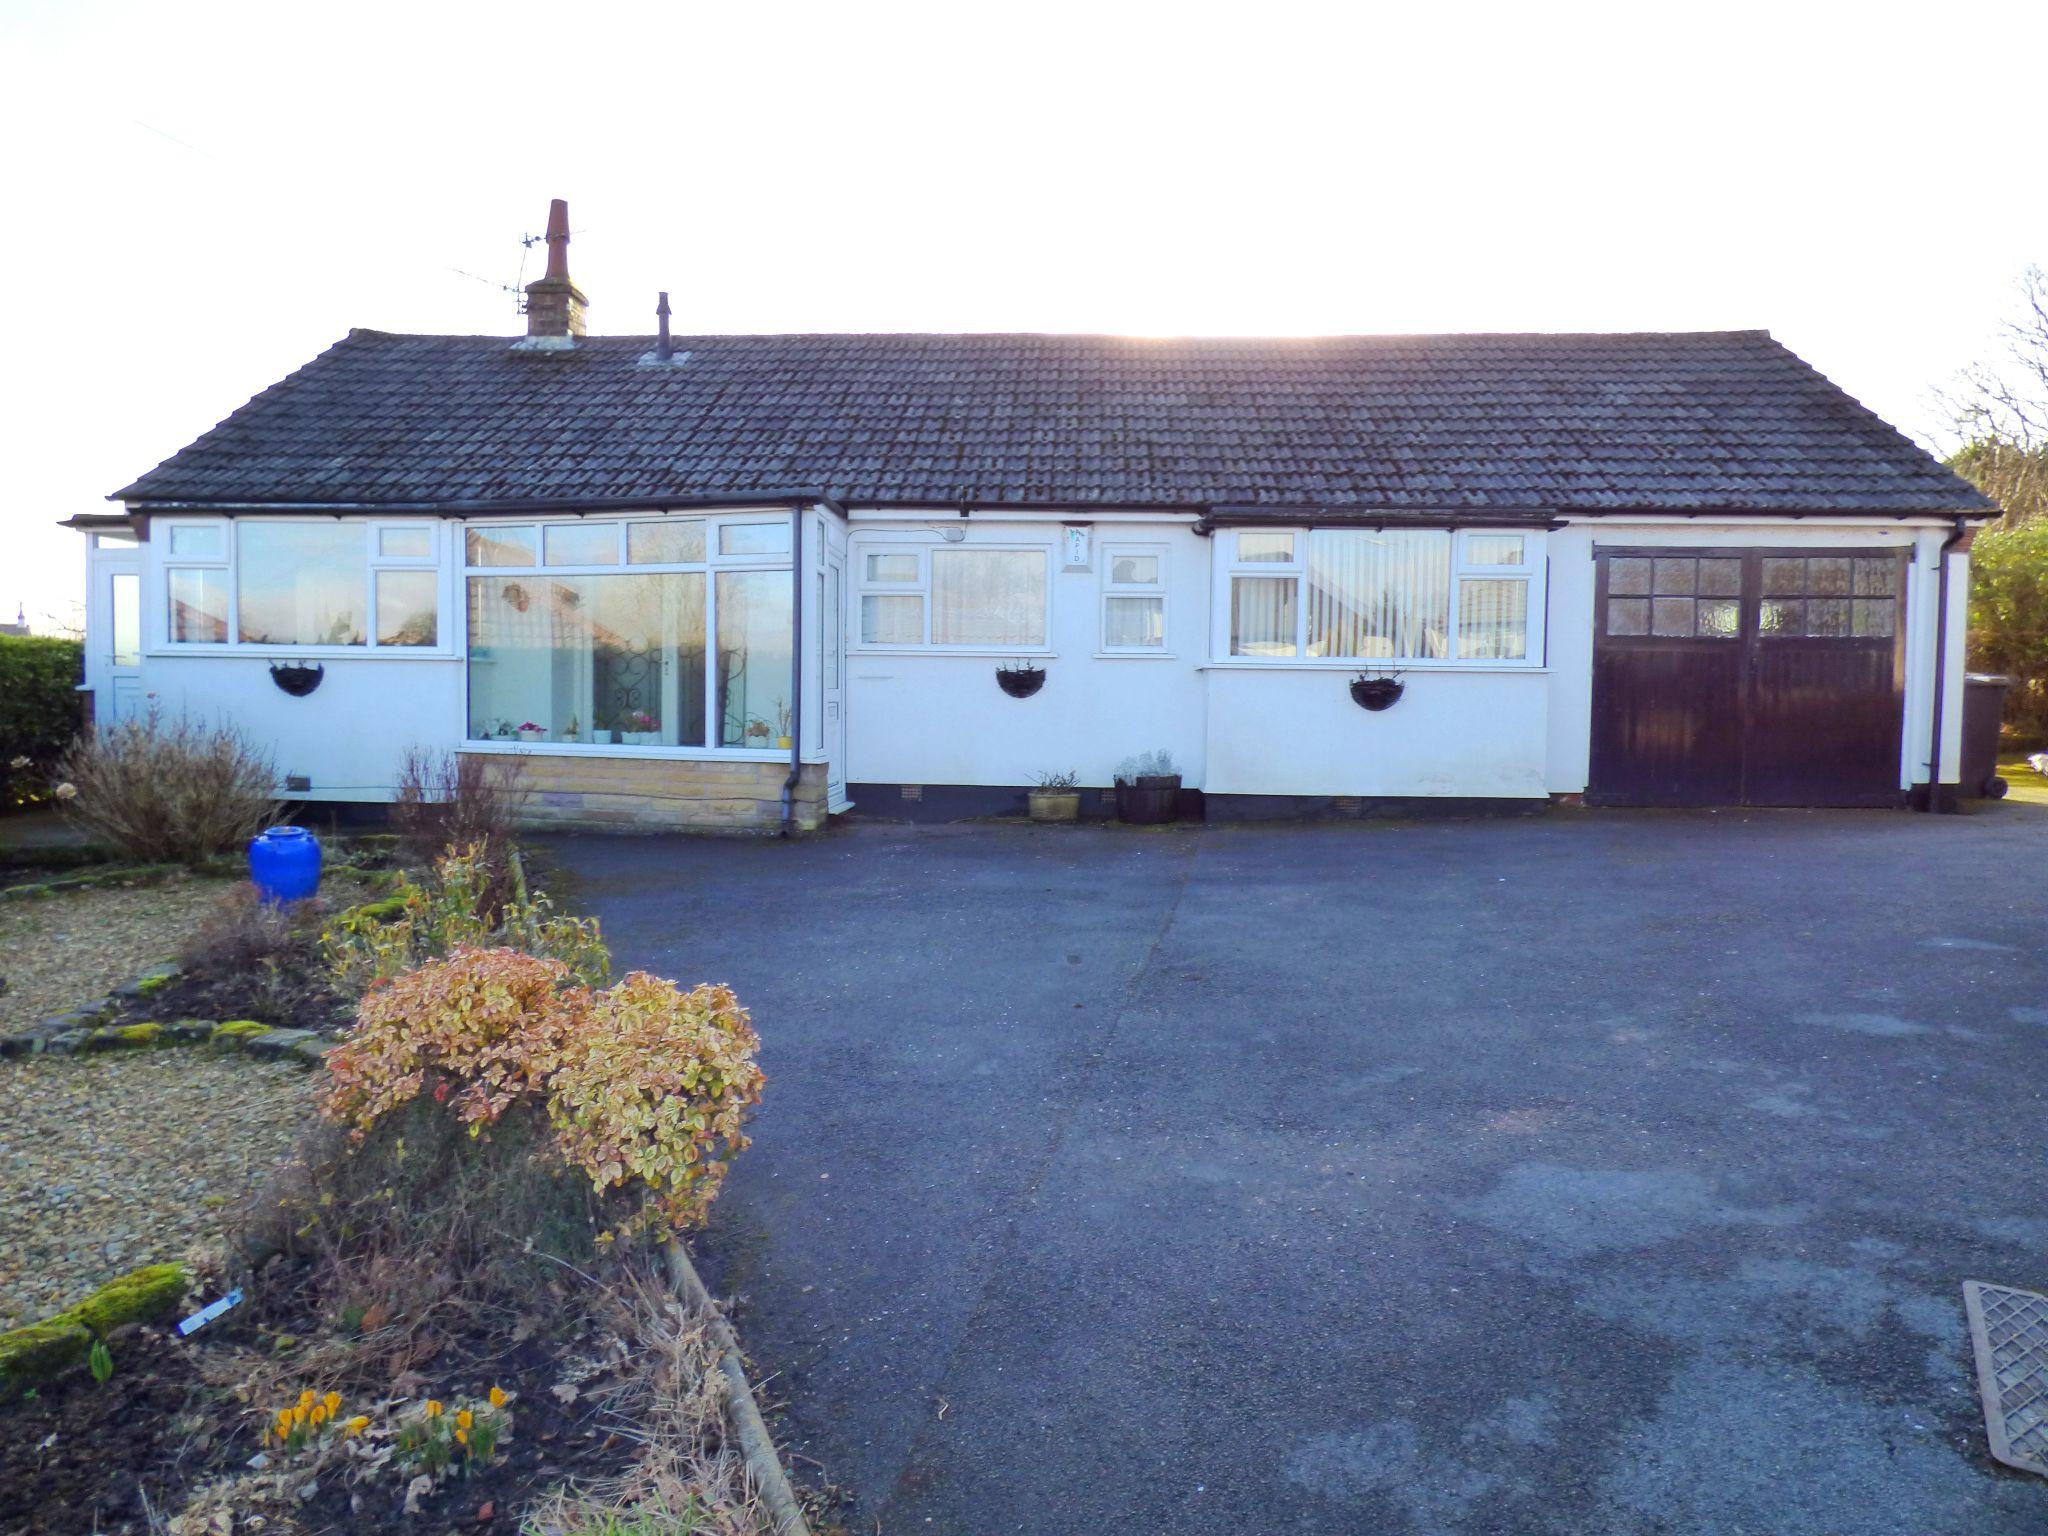 3 Bedroom Detached Bungalow For Sale - Front External